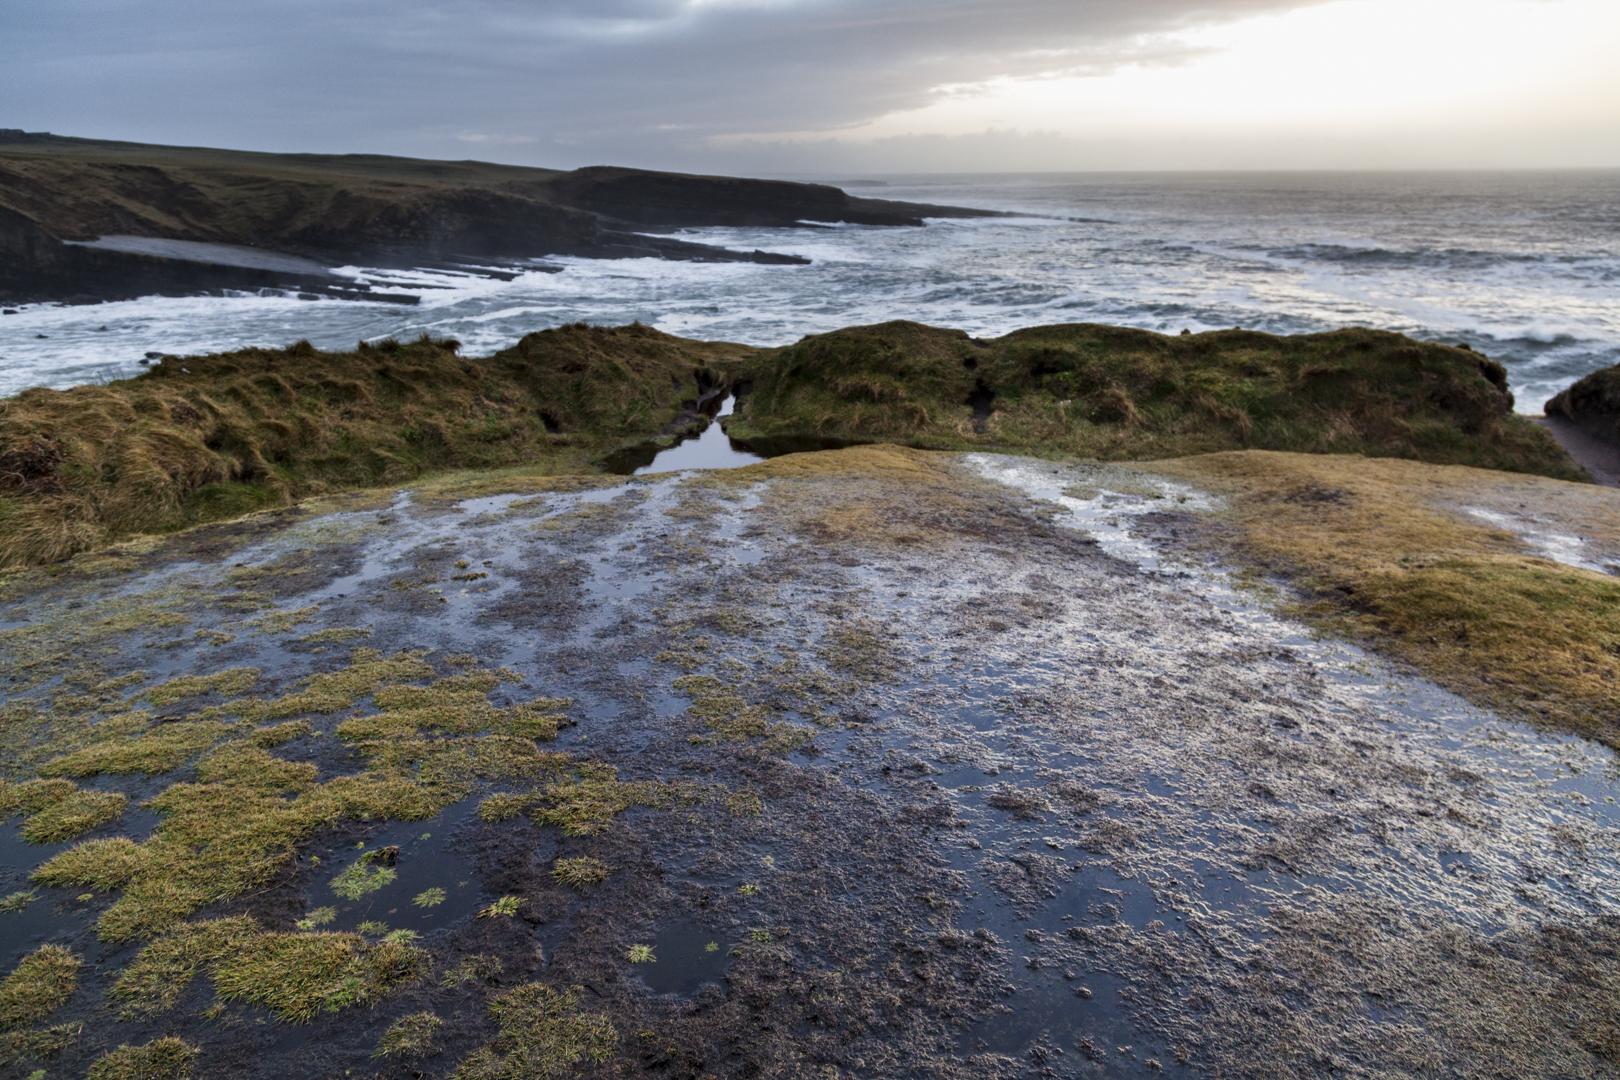 20180219 Mullaghmore Cliffs 014.jpg